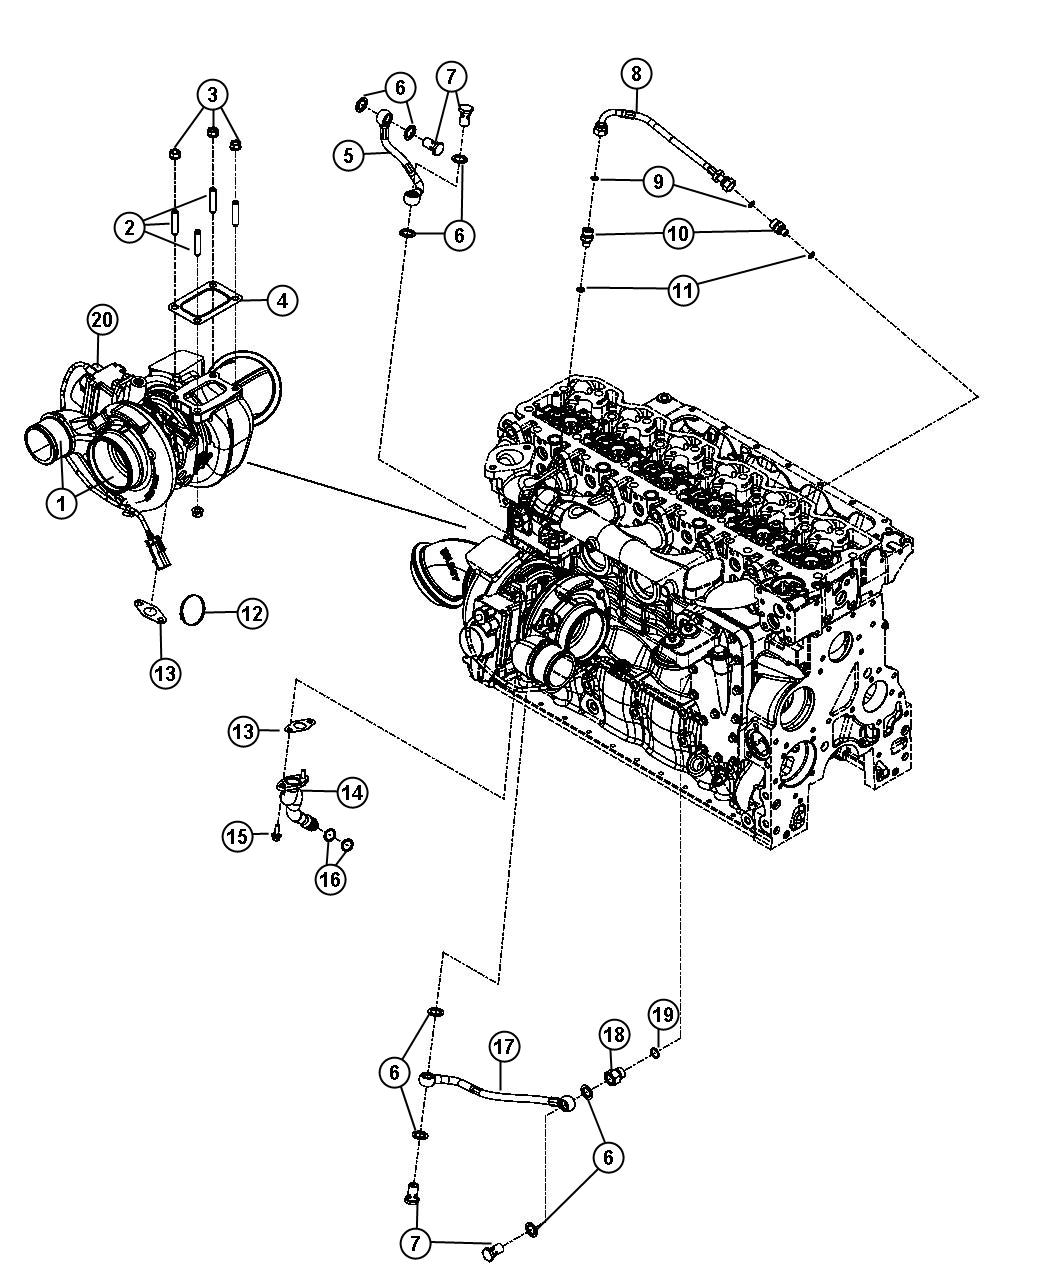 Dodge Ram Slt Quad Cab 6 7l Cummins Turbosel